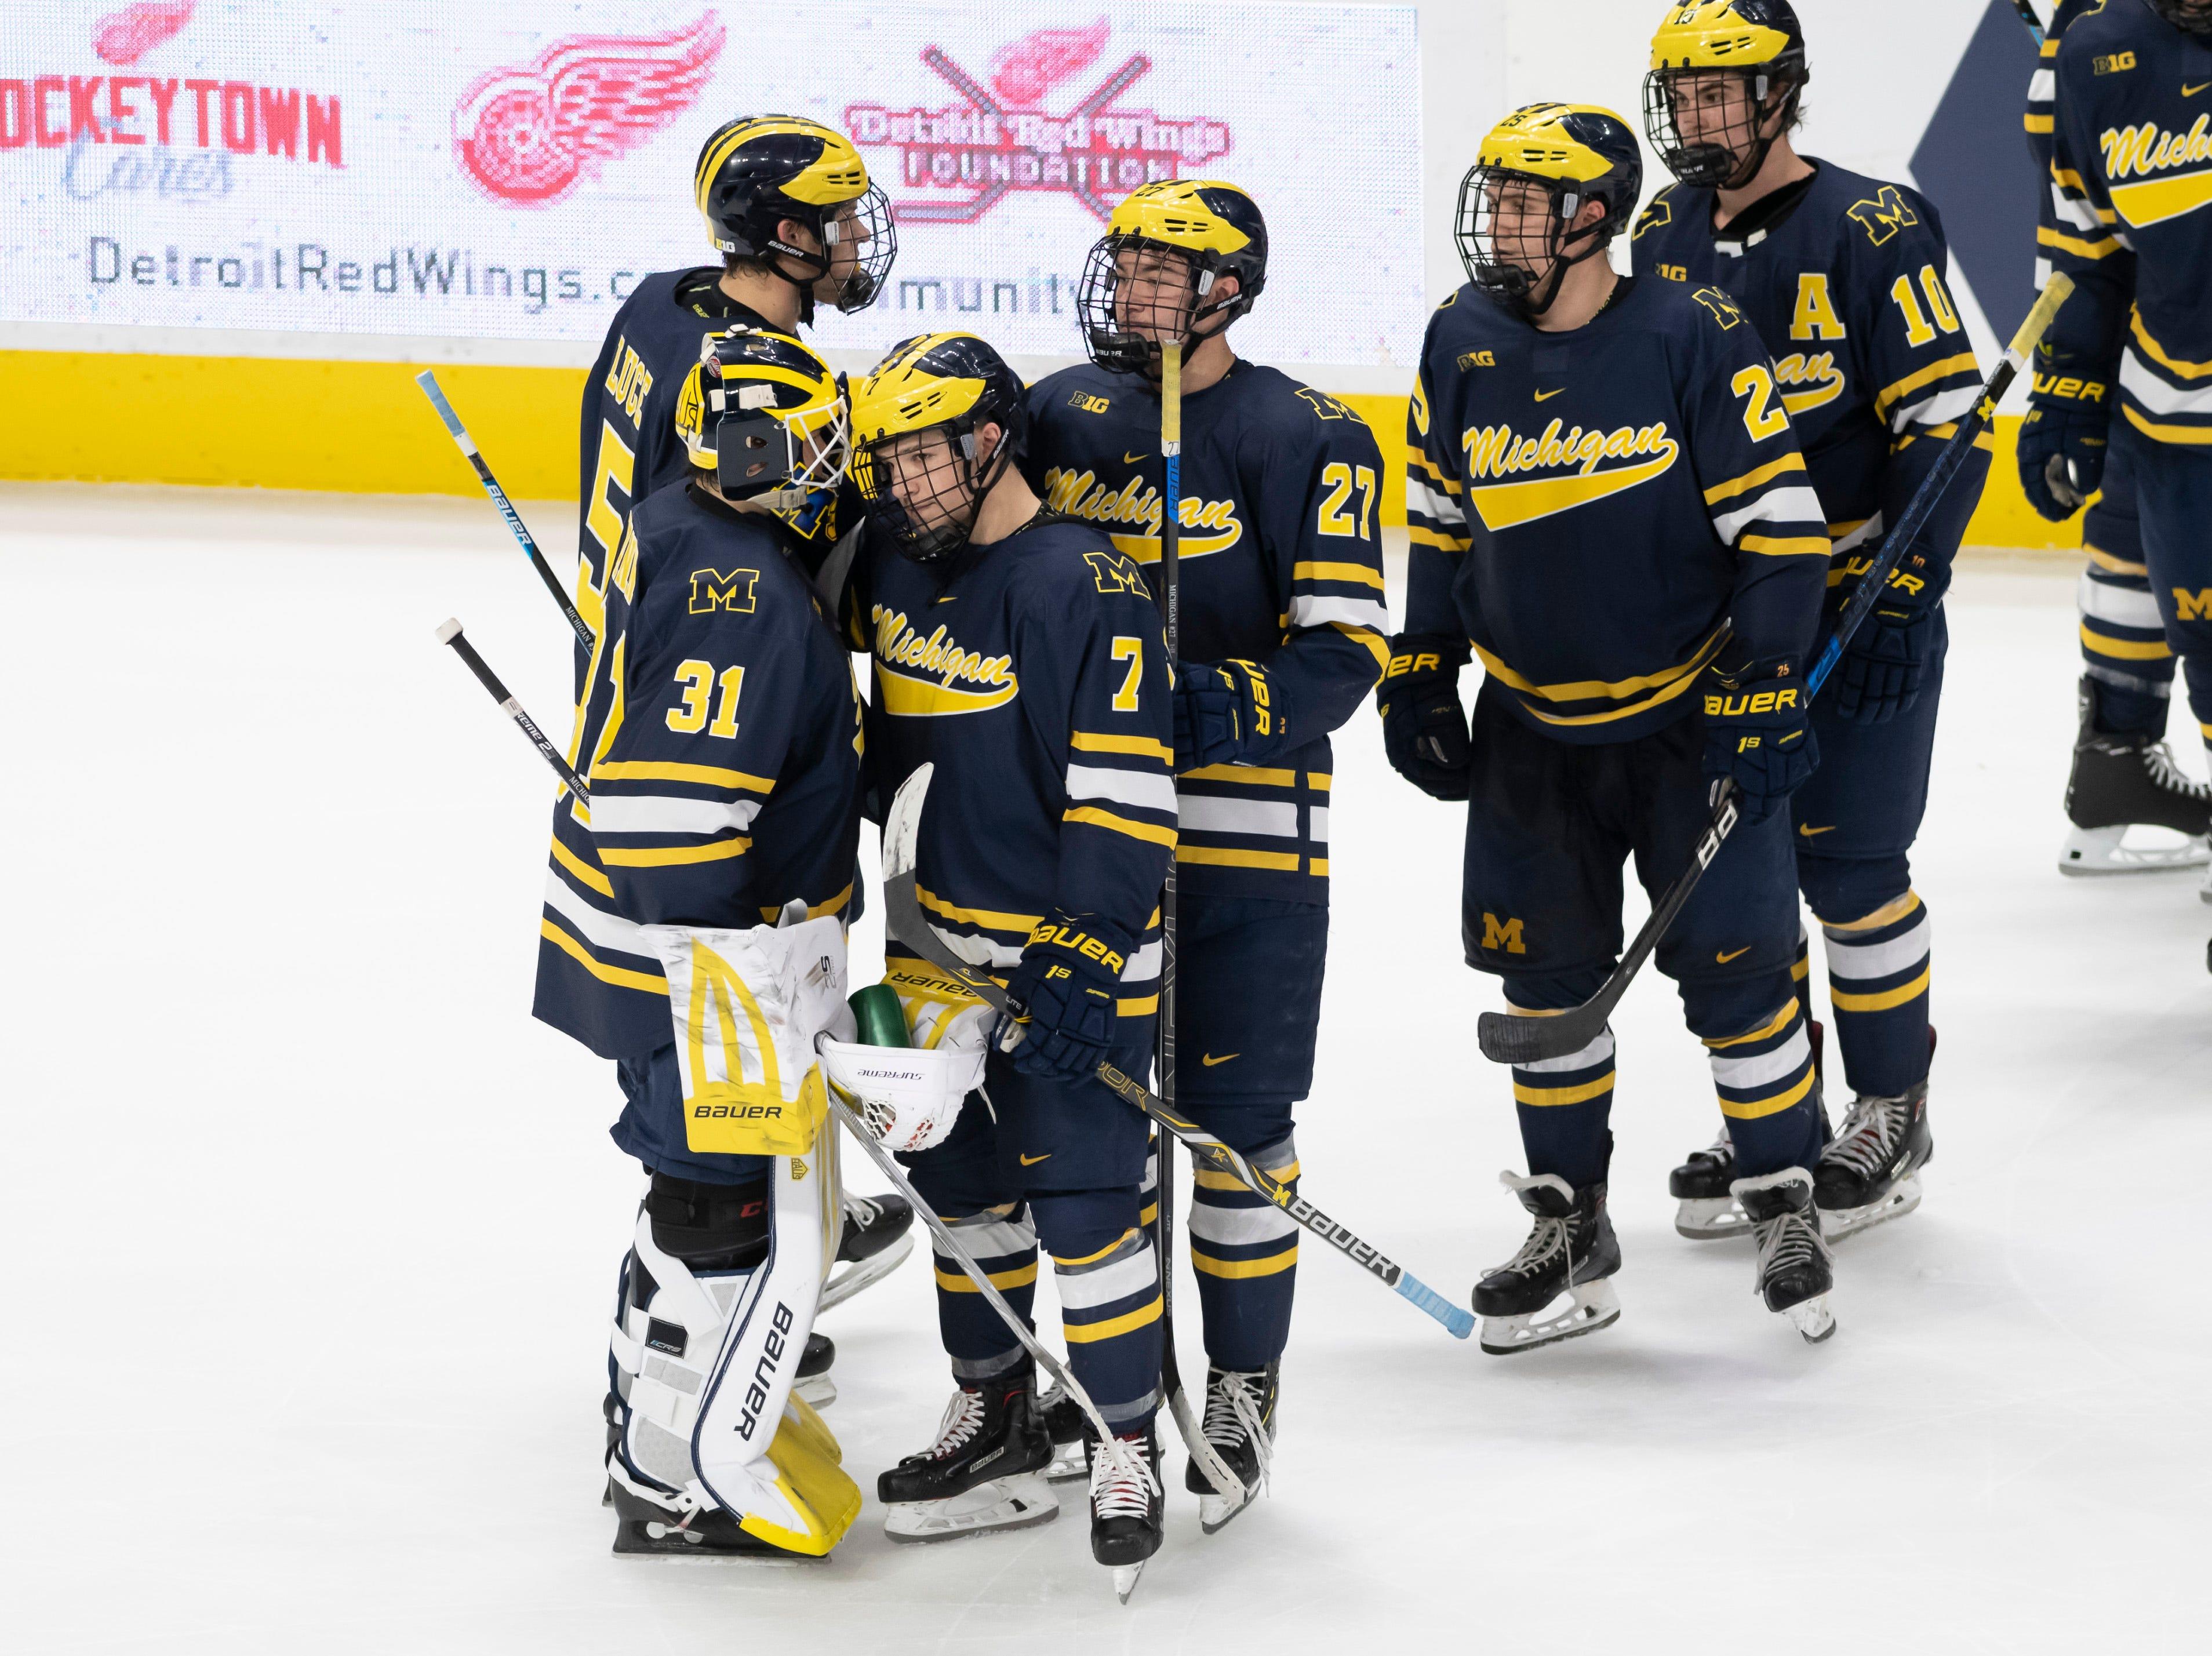 Michigan consoles goaltender Strauss Mann after losing to Michigan Tech in a shootout.